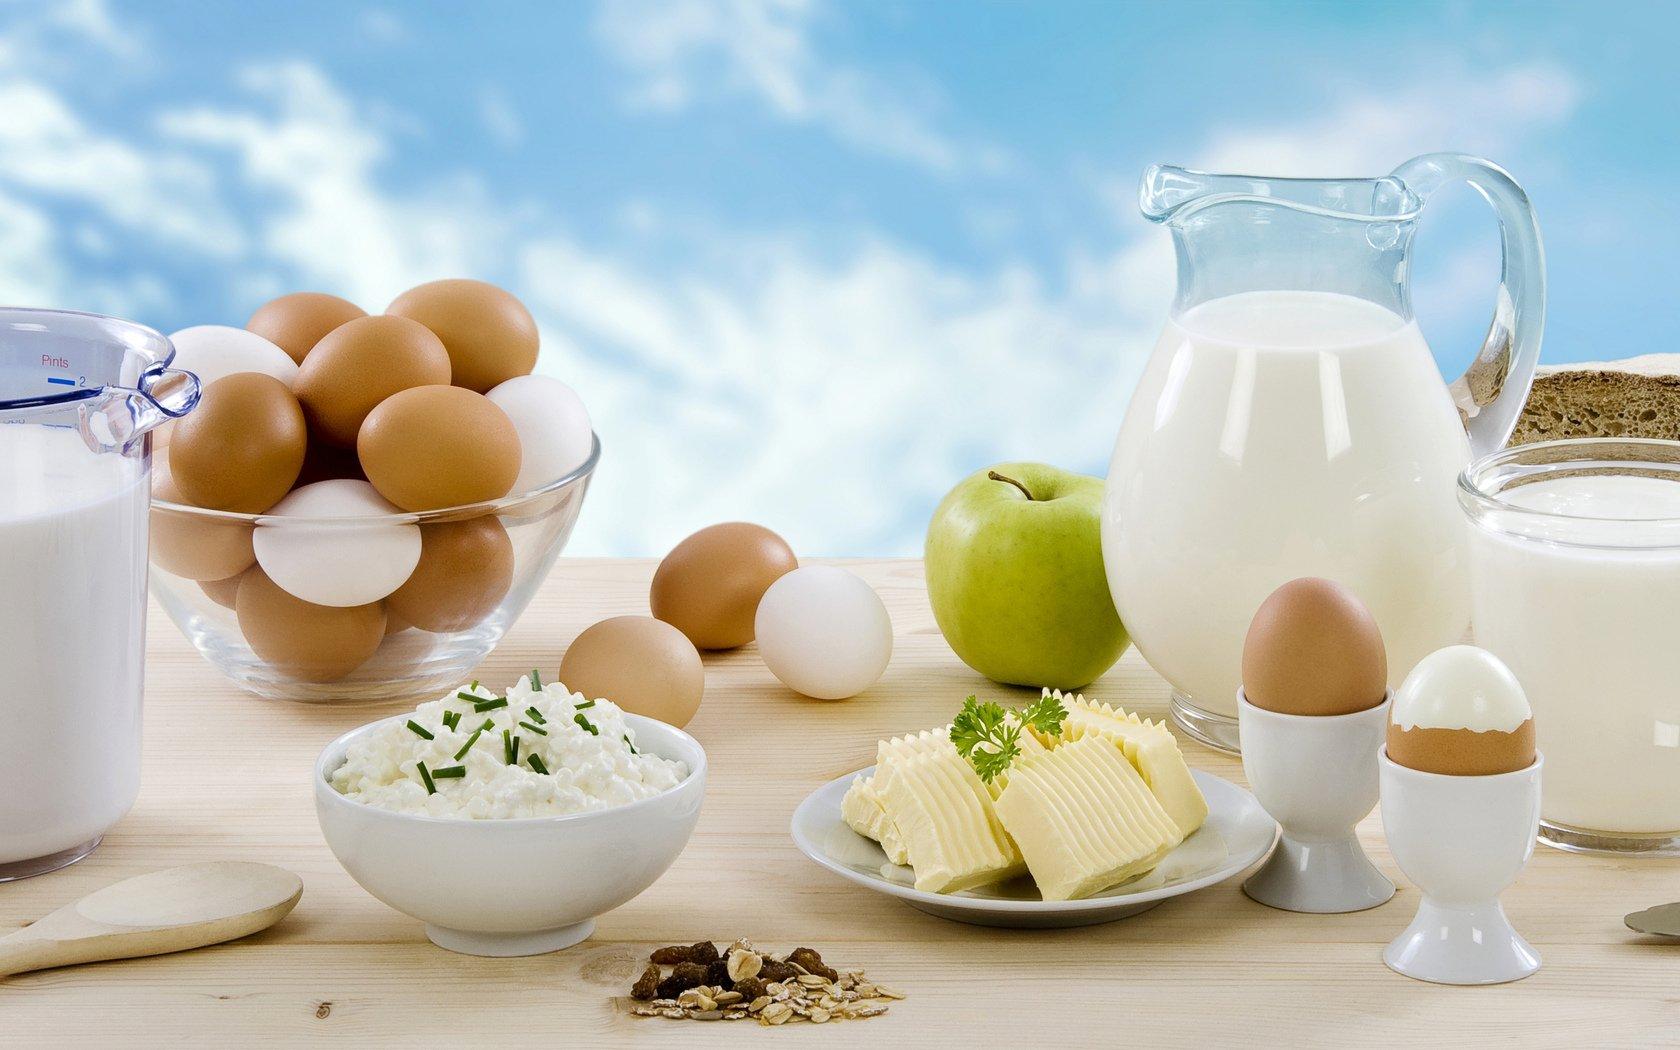 Milk #25